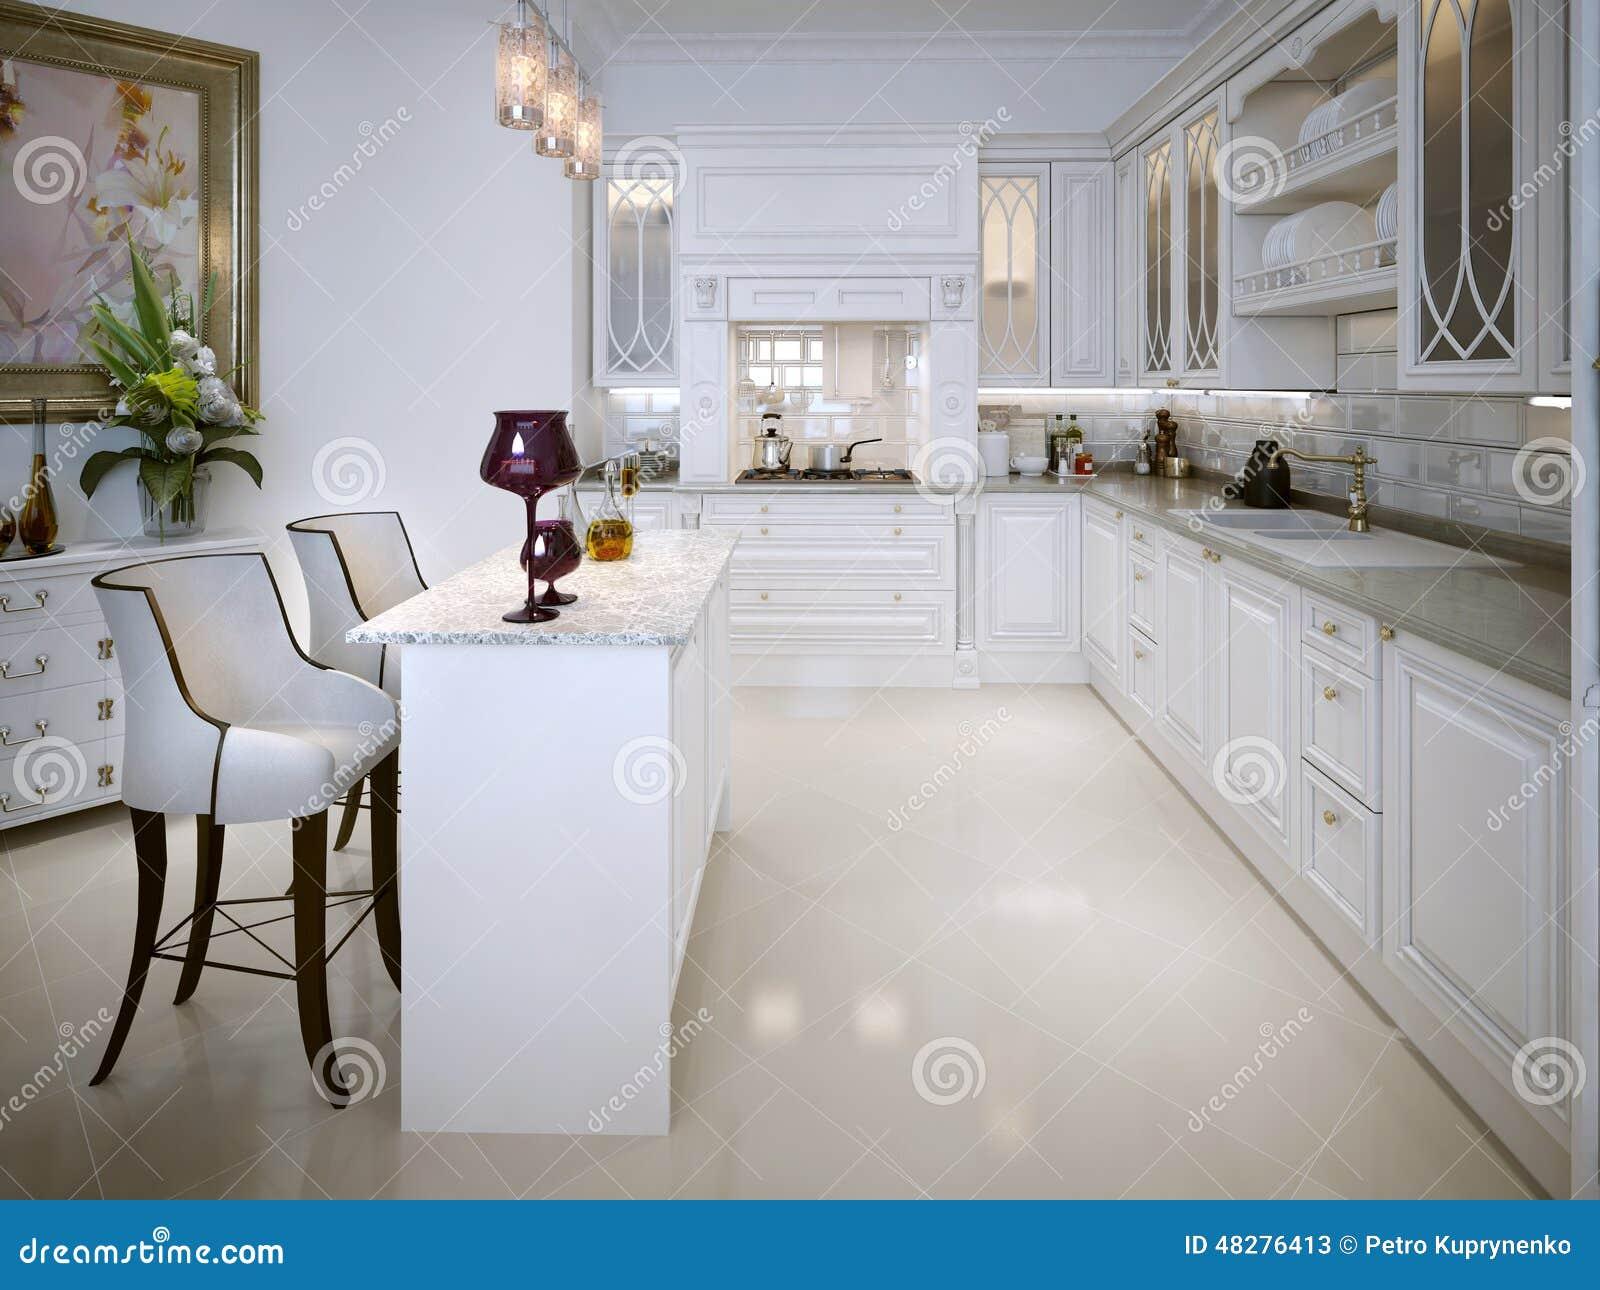 Keuken in klassieke stijl